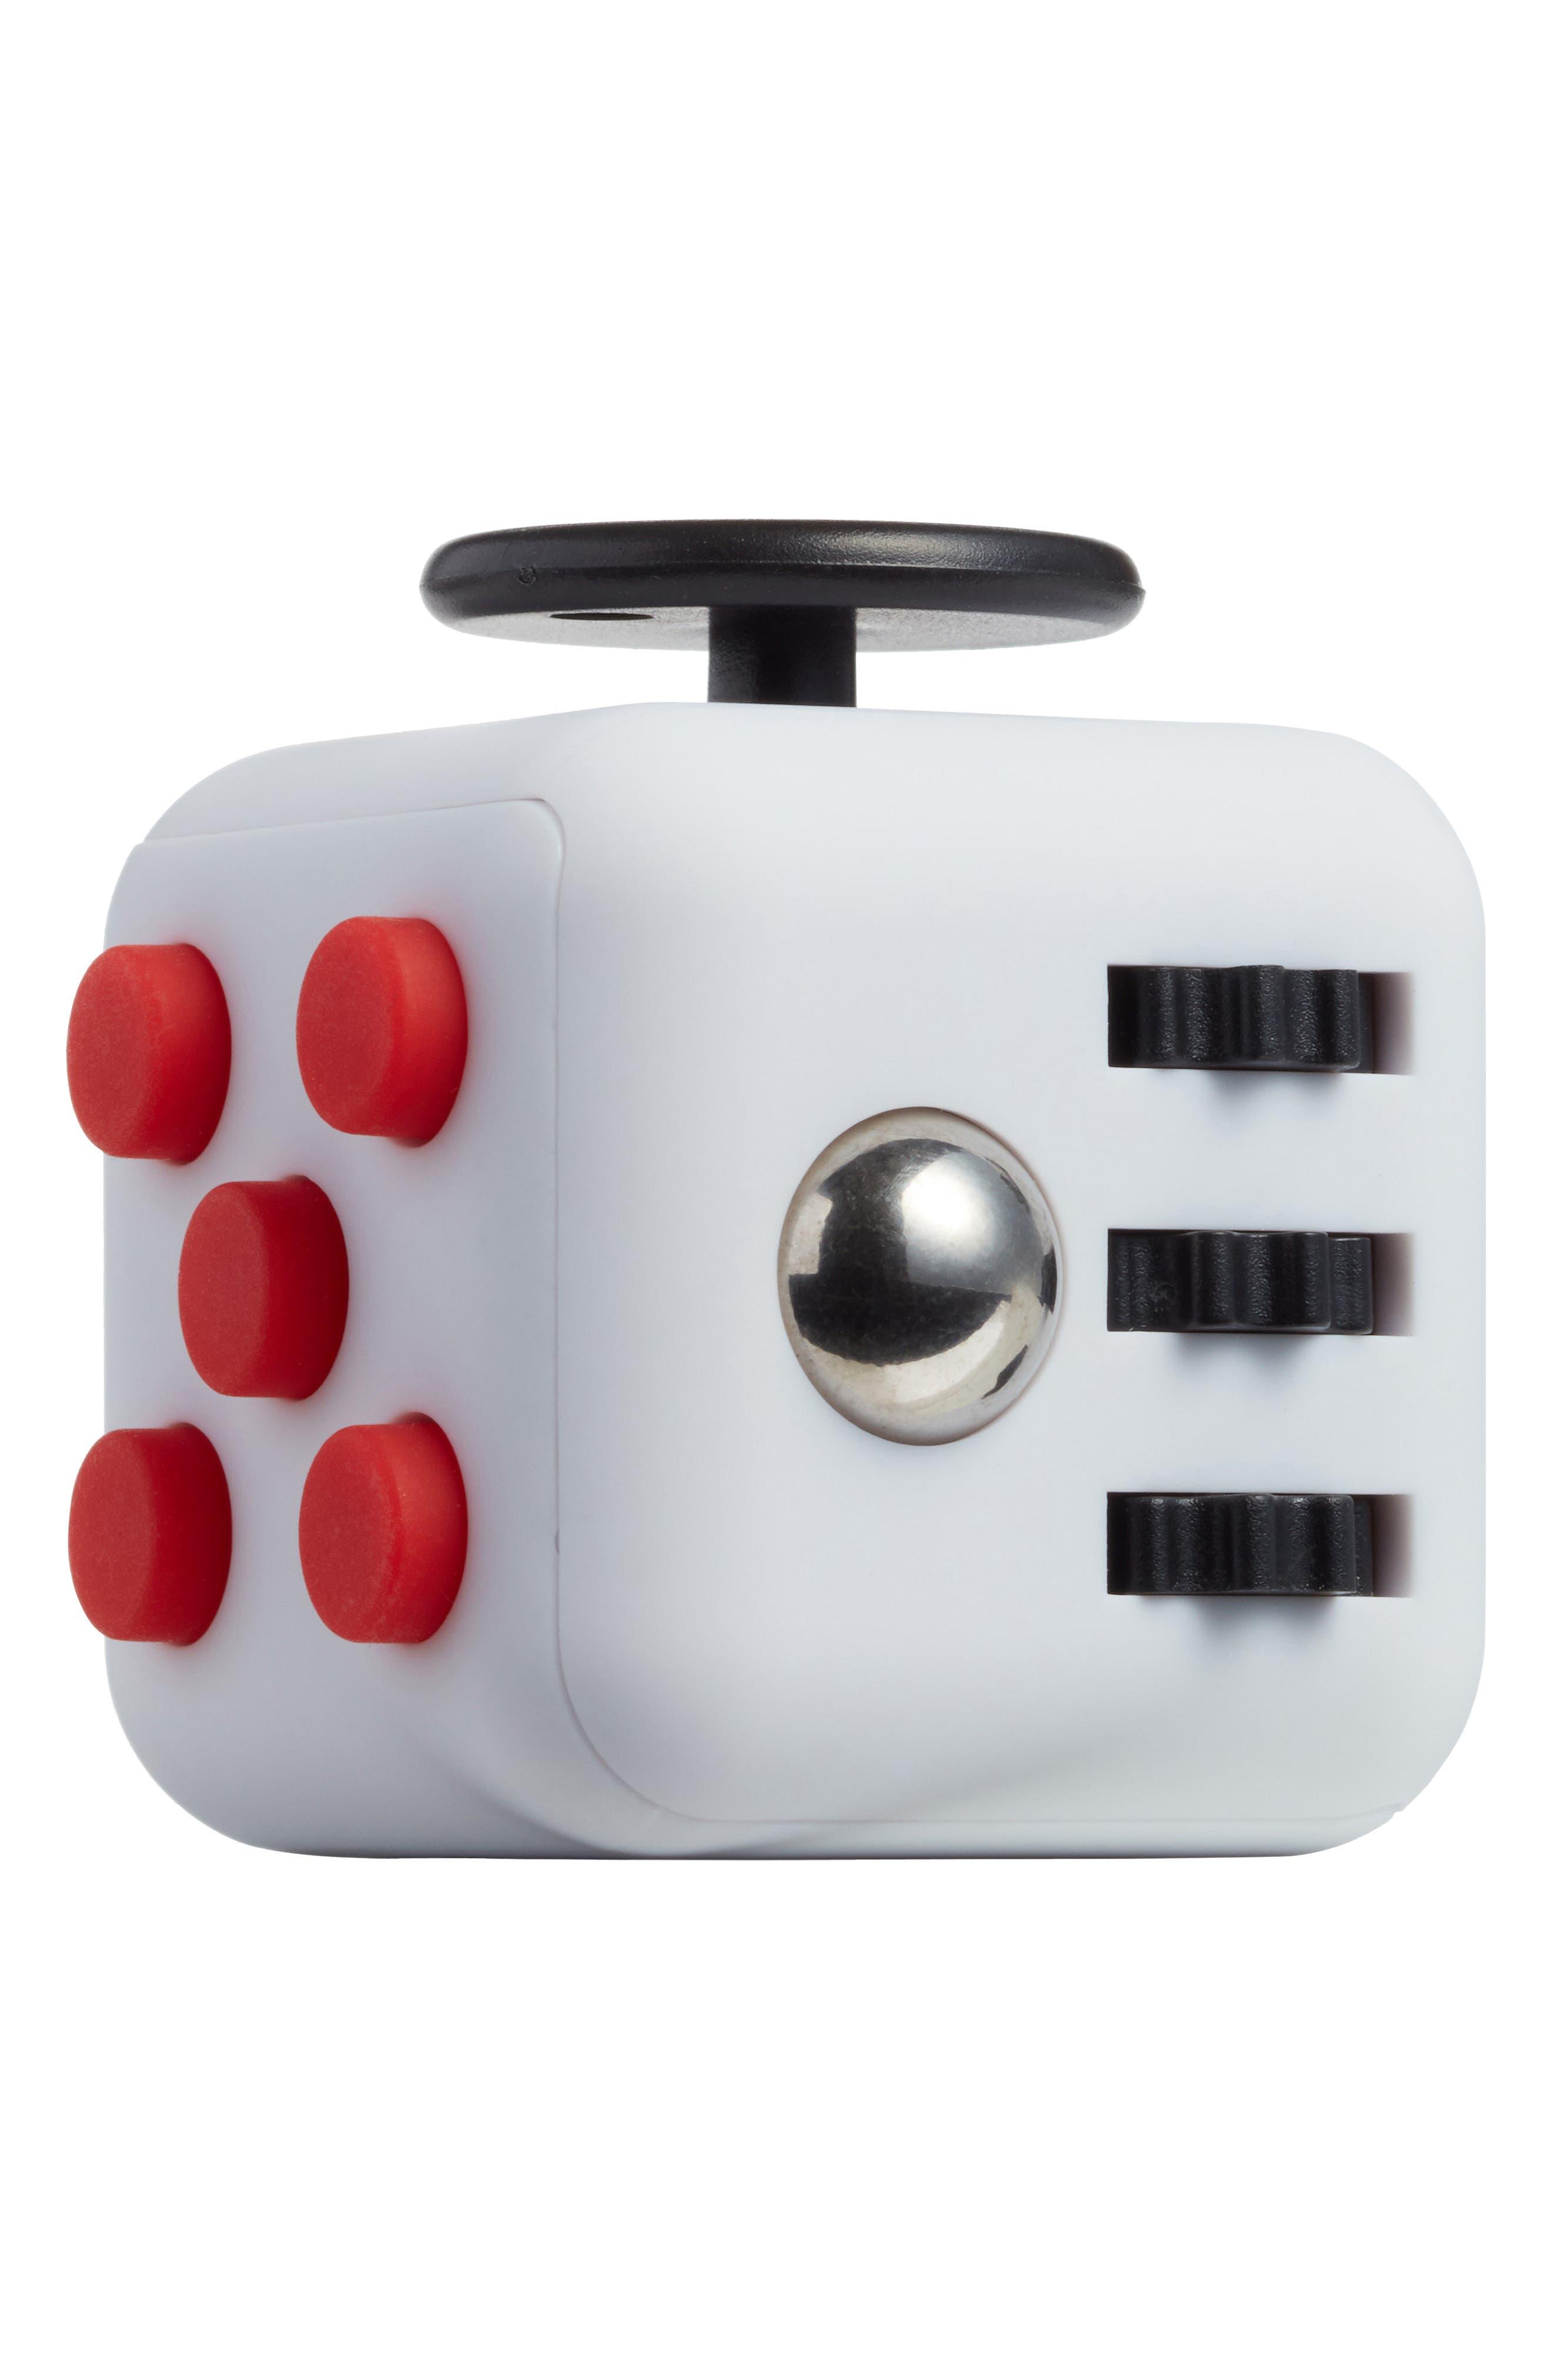 ADDICTIVE FIDGET SPINNERS Addictive Fidget Toys Fidget Stress Cube